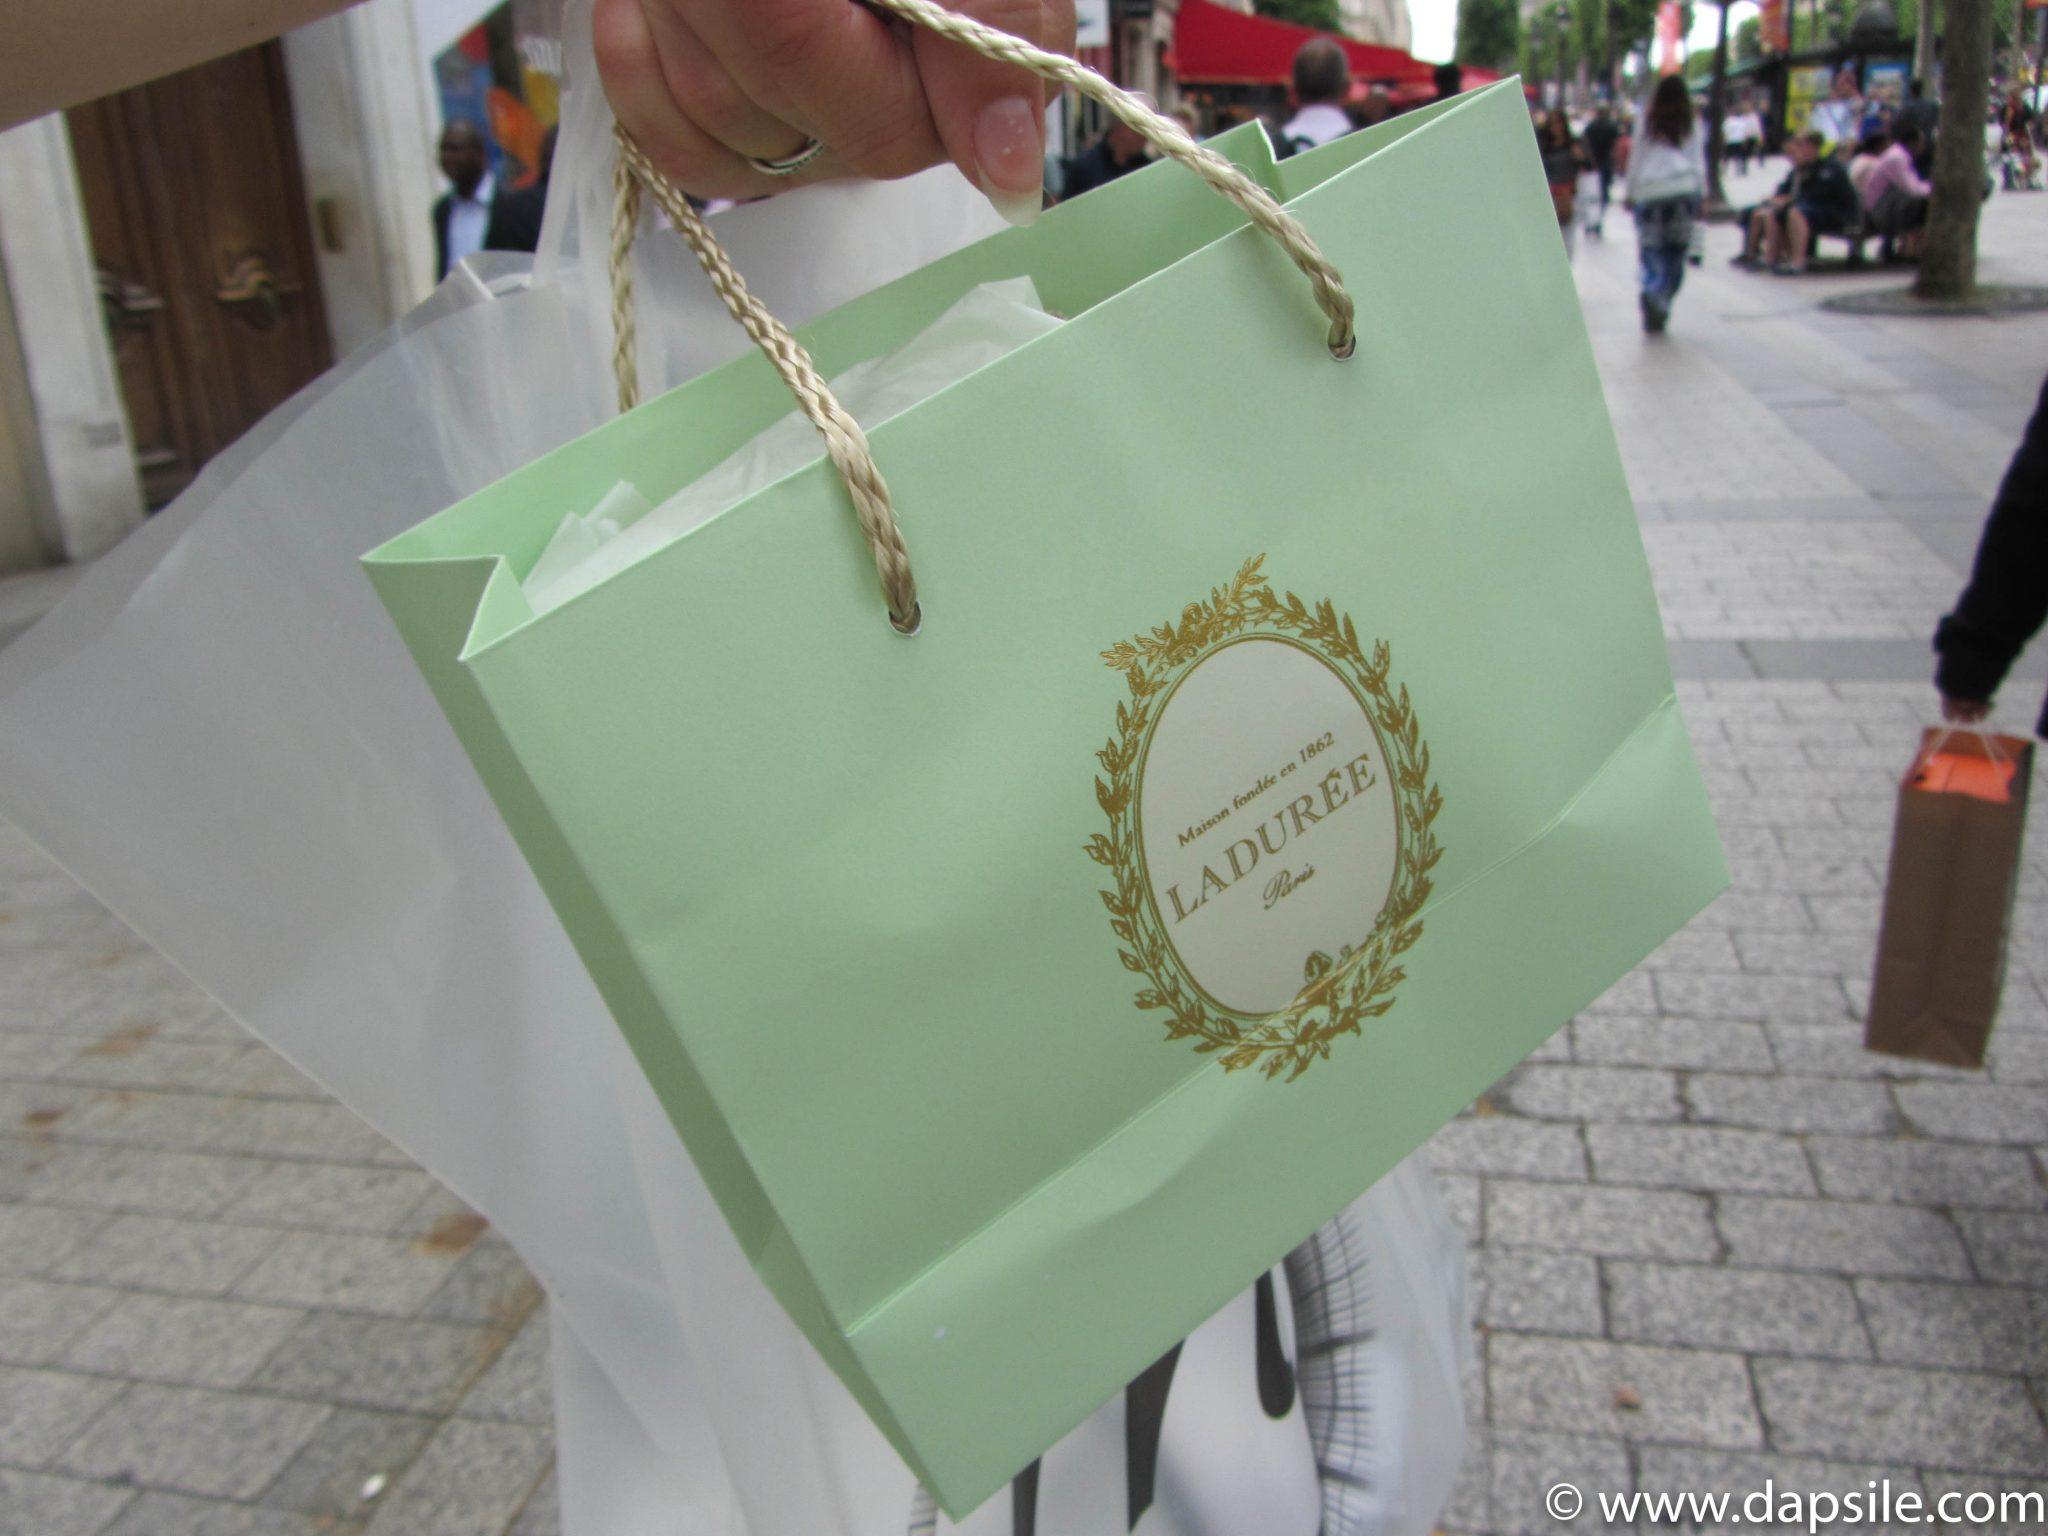 Paris Sights Laduree Shopping Bag